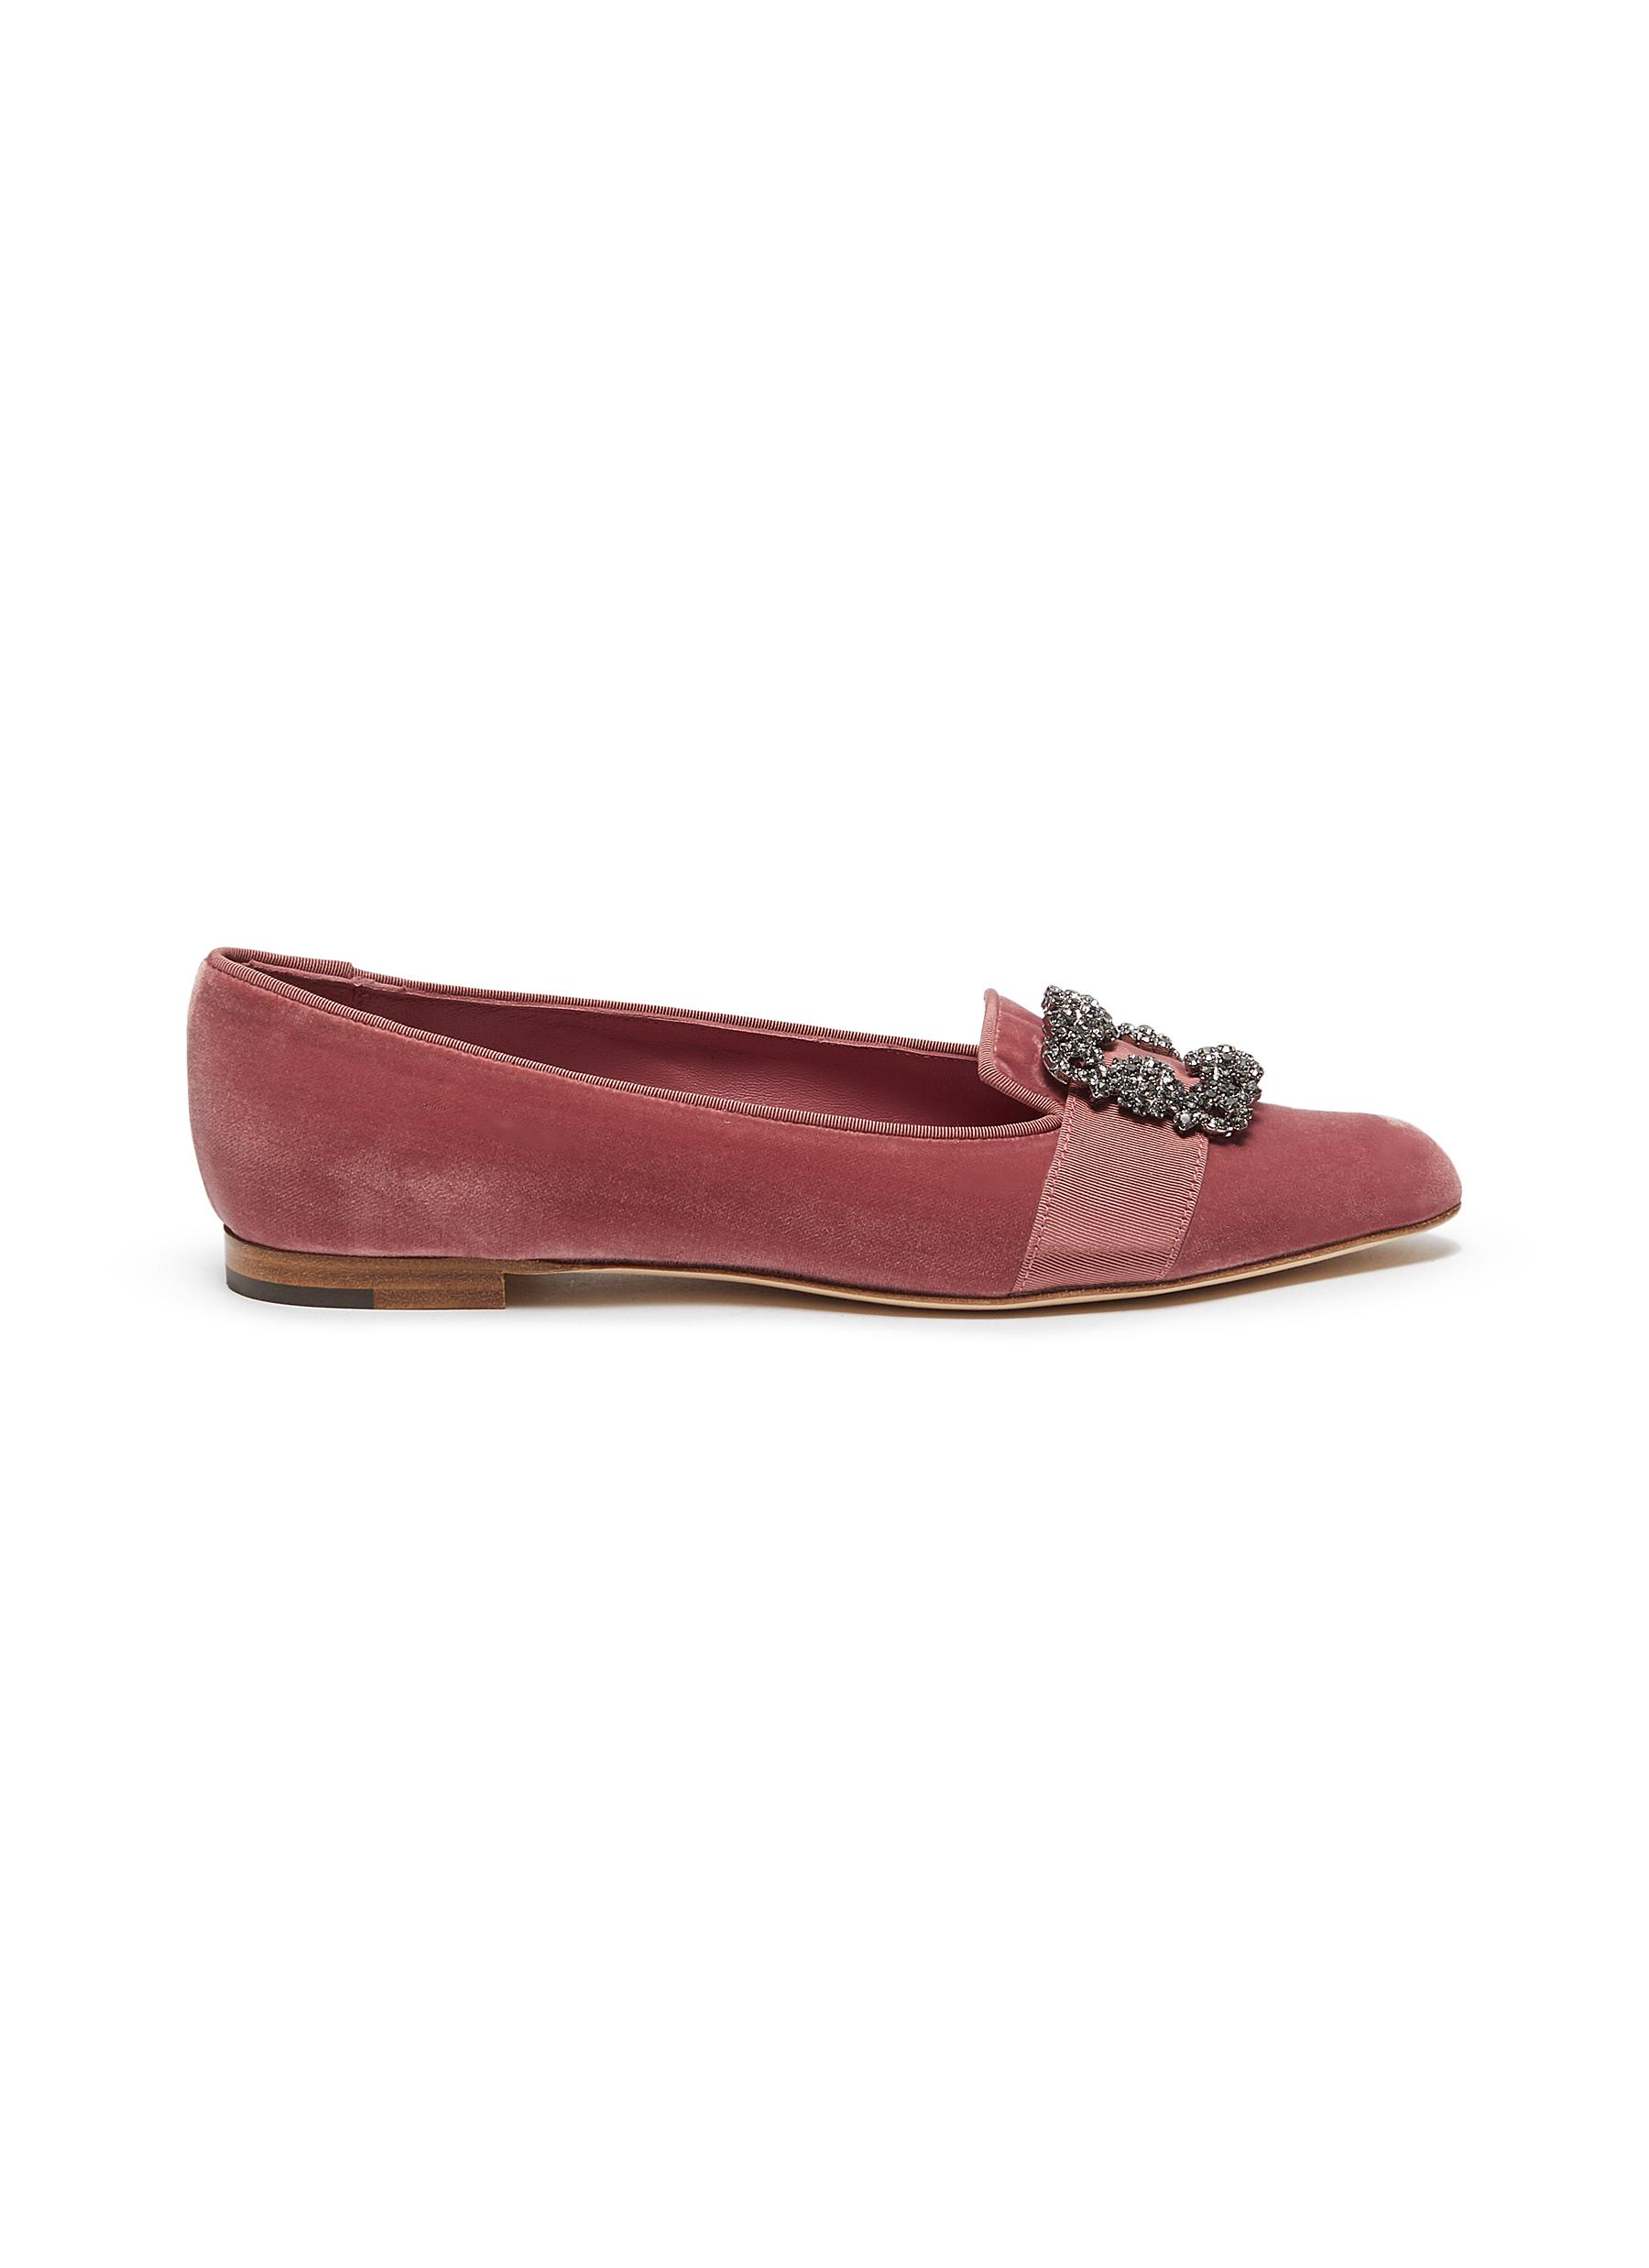 Manolo Blahnik Flats Marria Swarovski crystal brooch velvet loafers